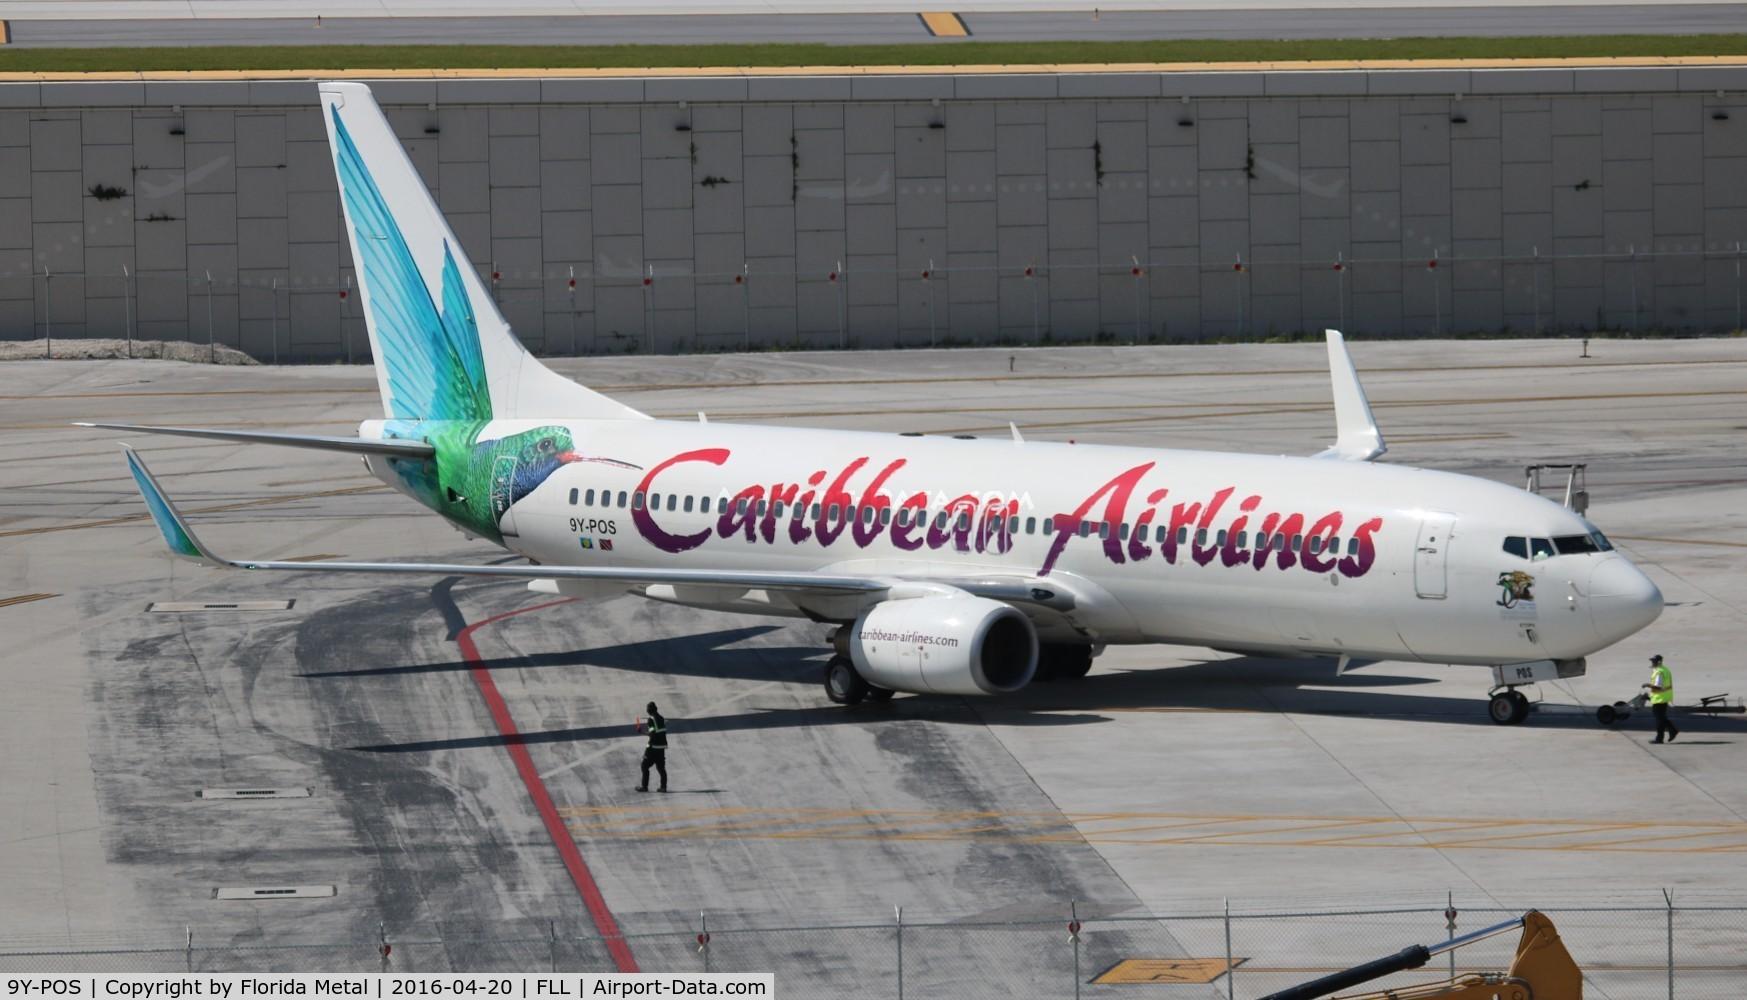 9Y-POS, 2000 Boeing 737-8Q8 C/N 28230, Caribbean